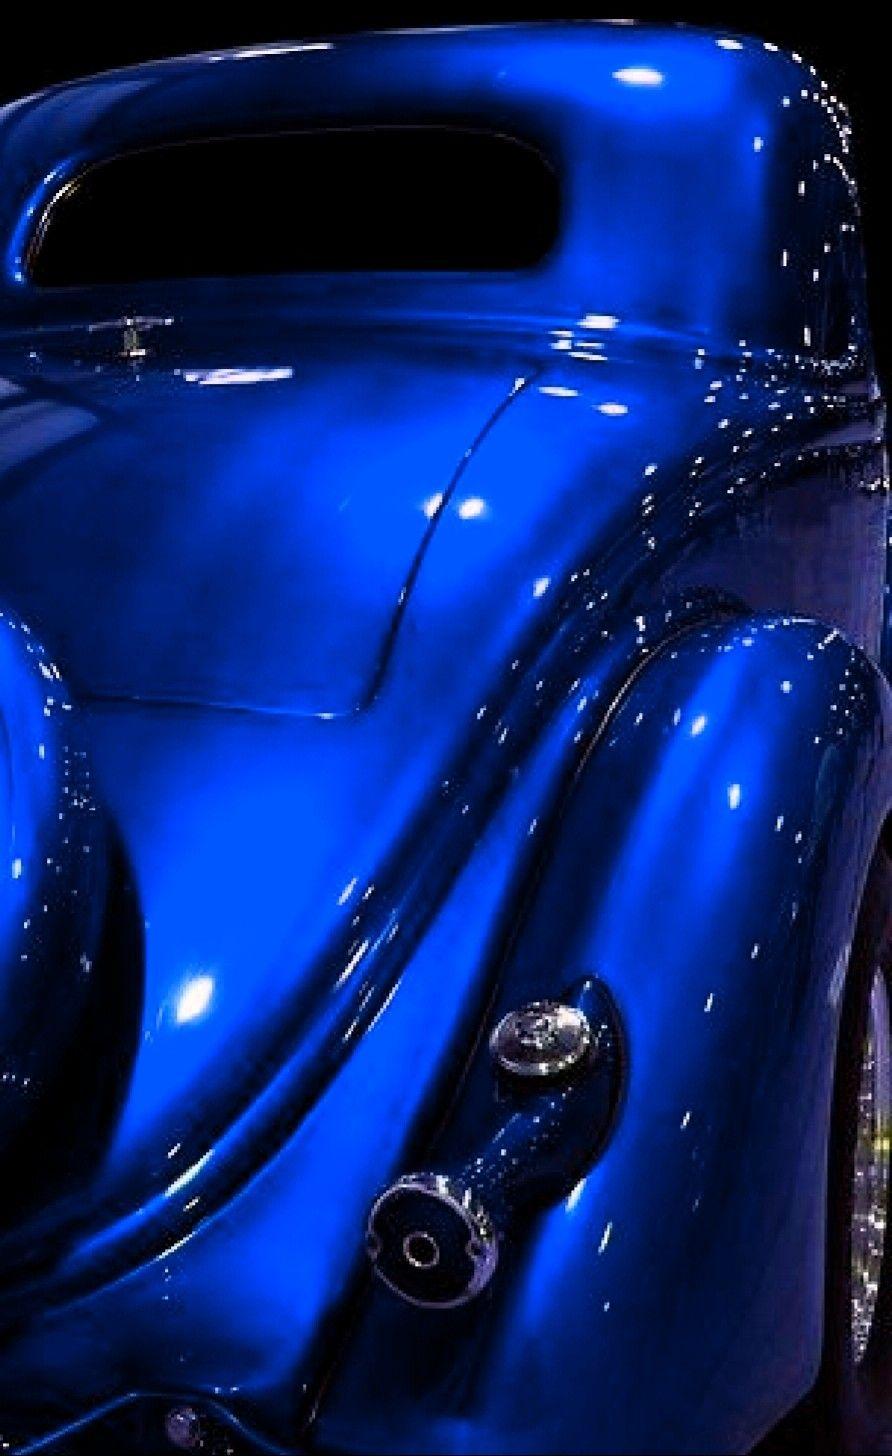 blue car | Blue car, Blue aesthetic, Feeling blue